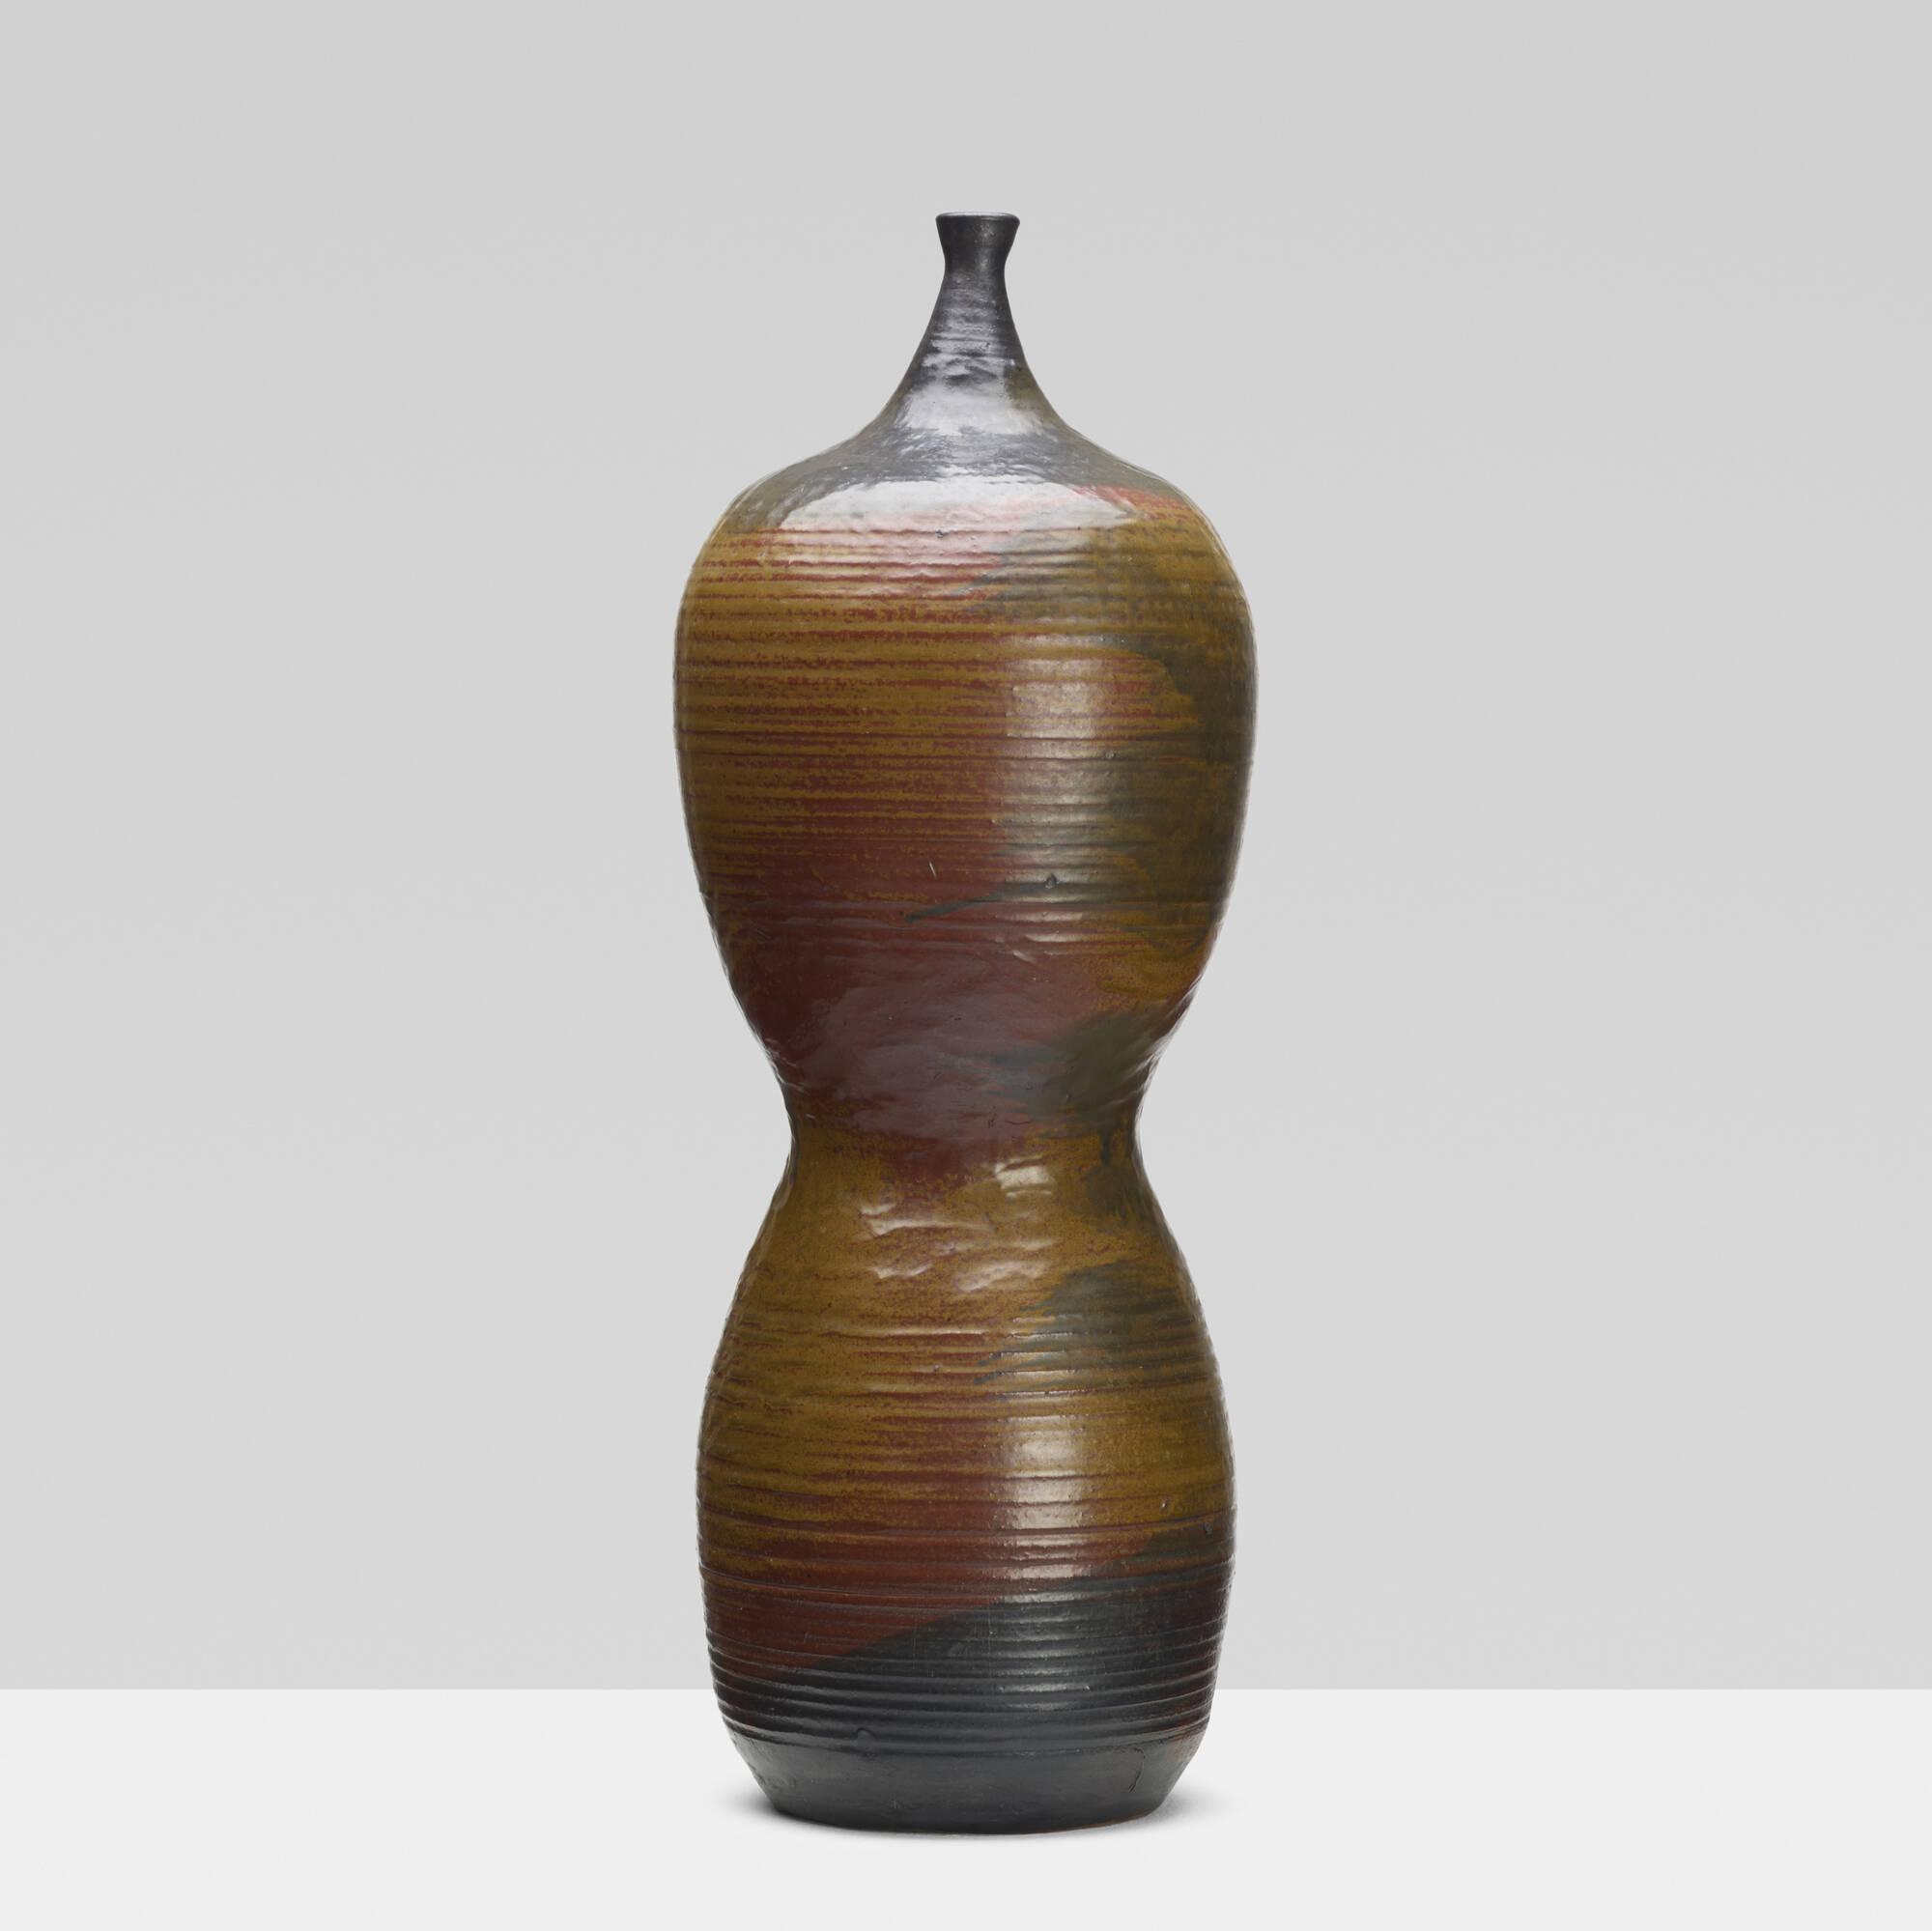 183: Toshiko Takaezu / vase (1 of 2)